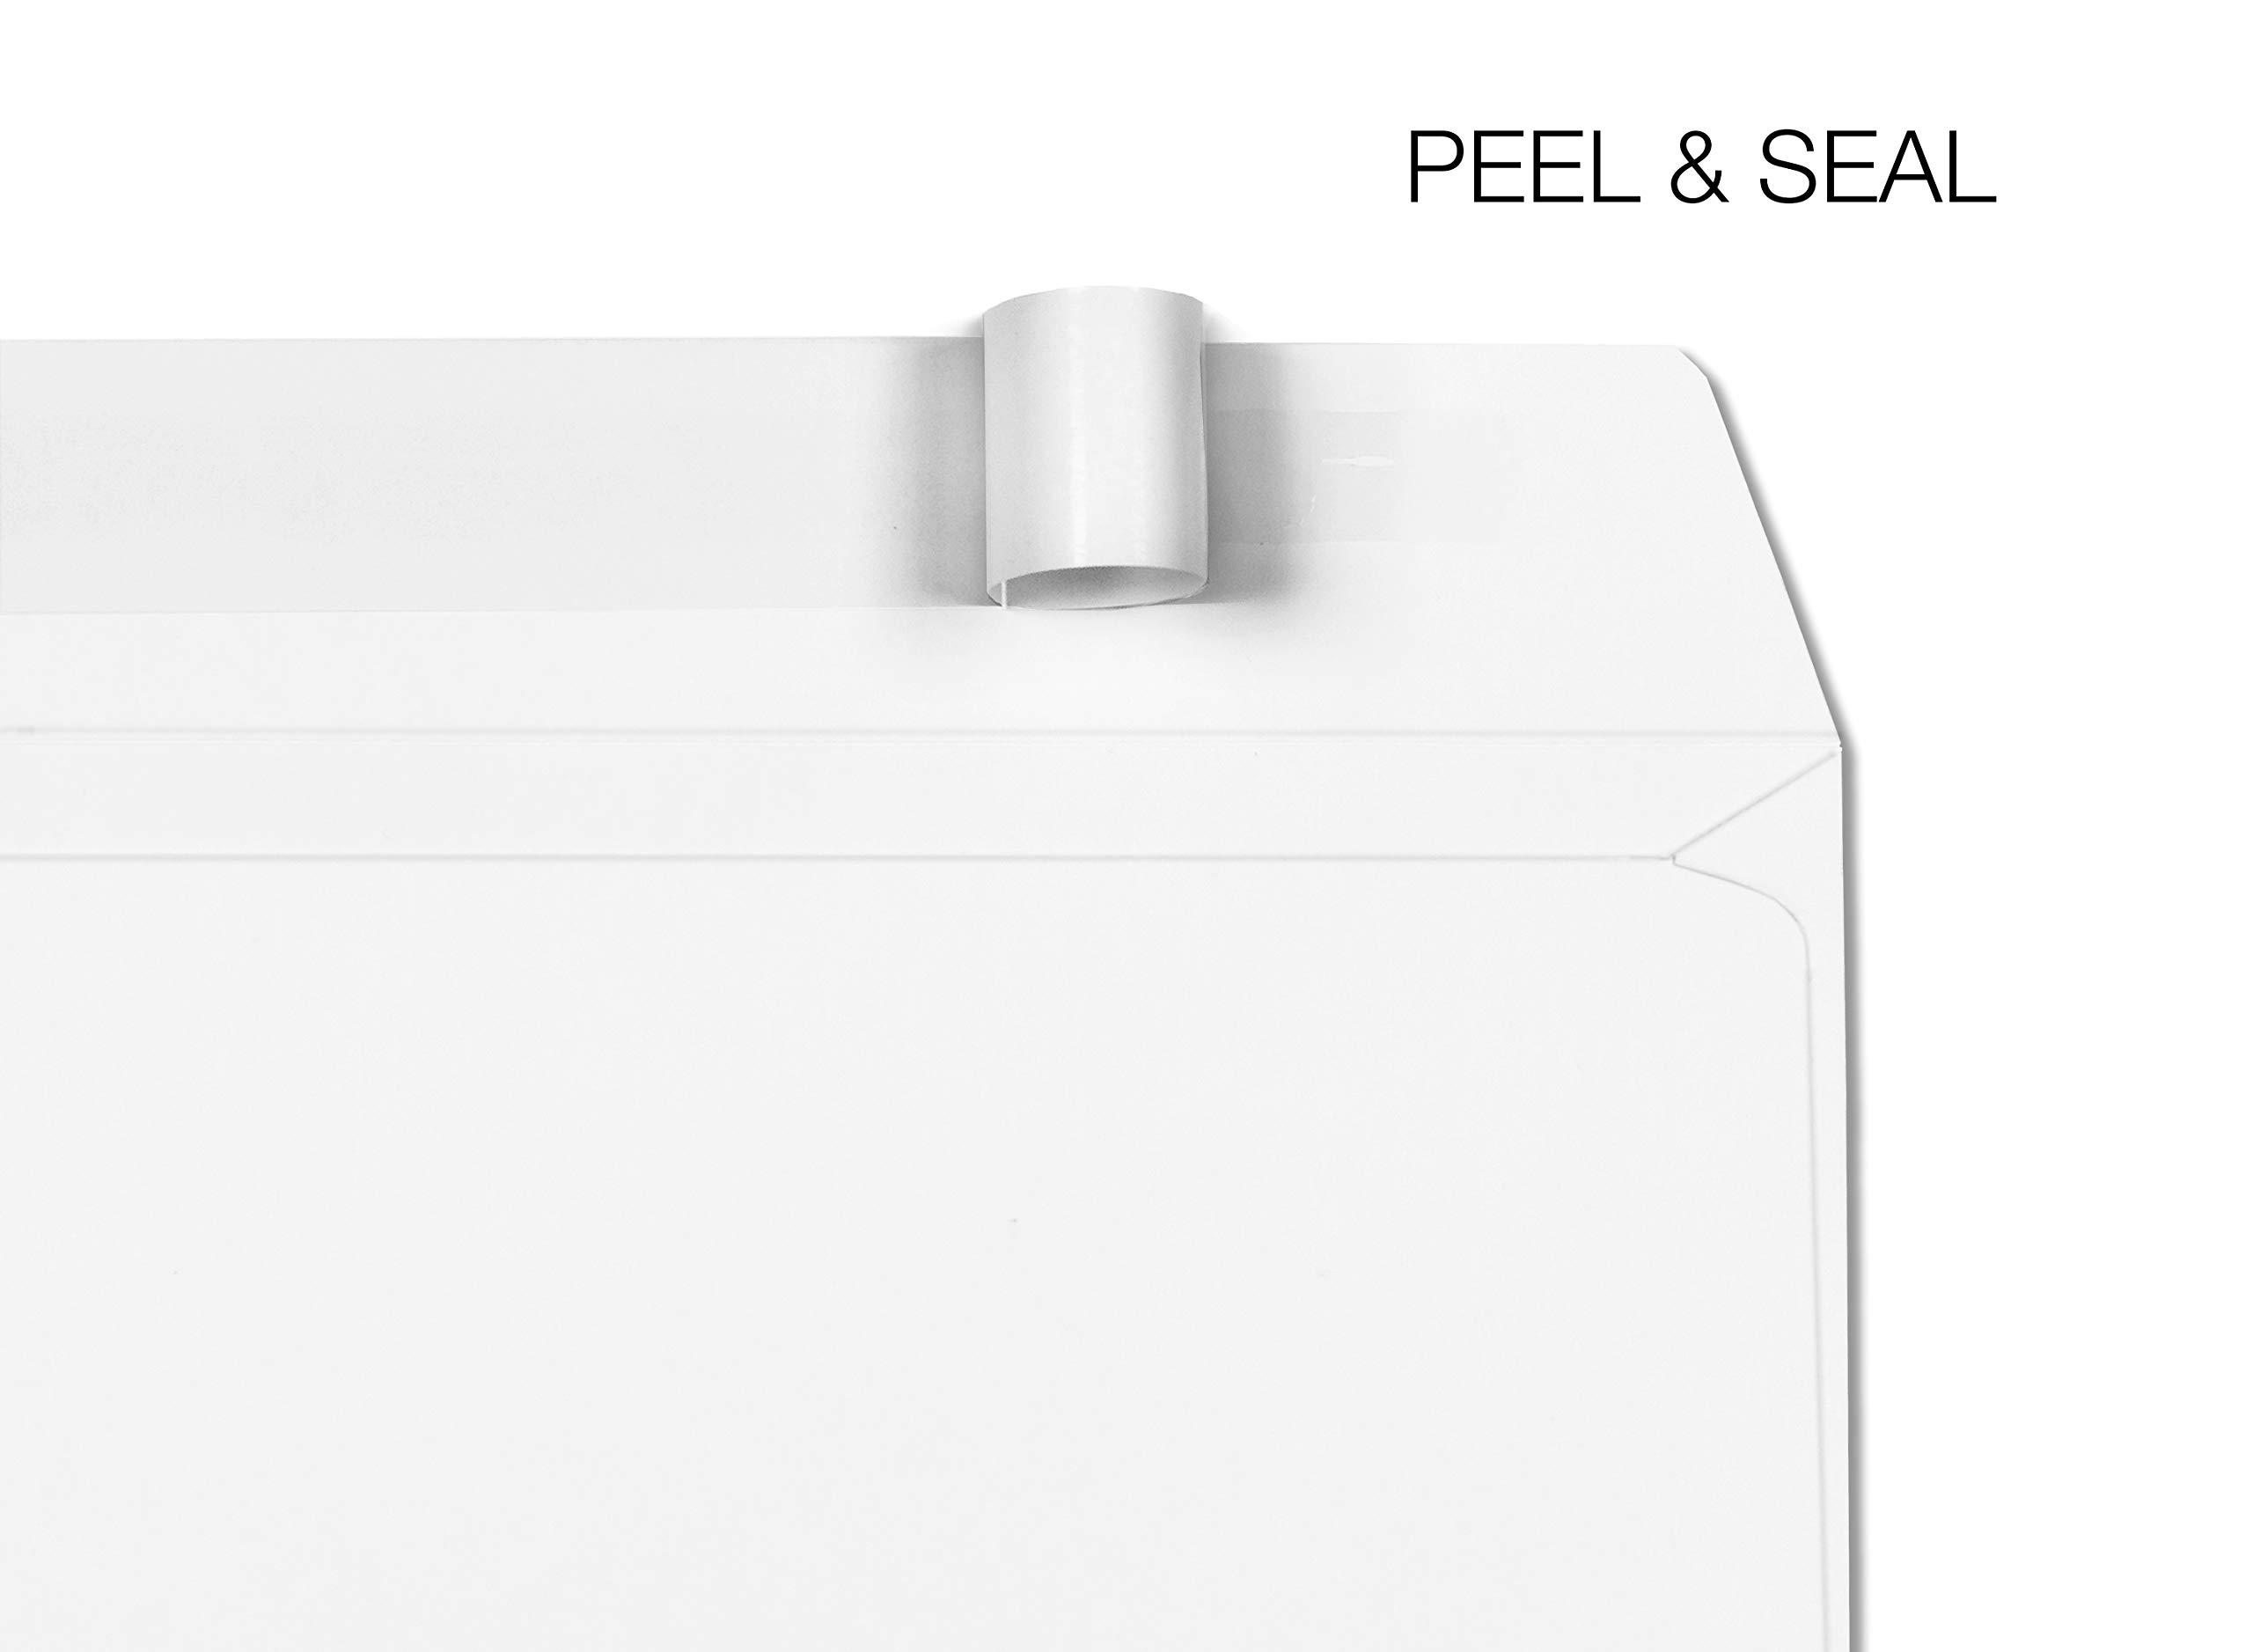 6 X 9 Booklet Envelopes Self Seal - Heavy-Duty 28 Pound White Envelopes 6x9 - Open Side Peel & Seal Envelopes (Pack of 50) - 6x9 Invitation Envelopes for Booklets, Letters, and Brochures